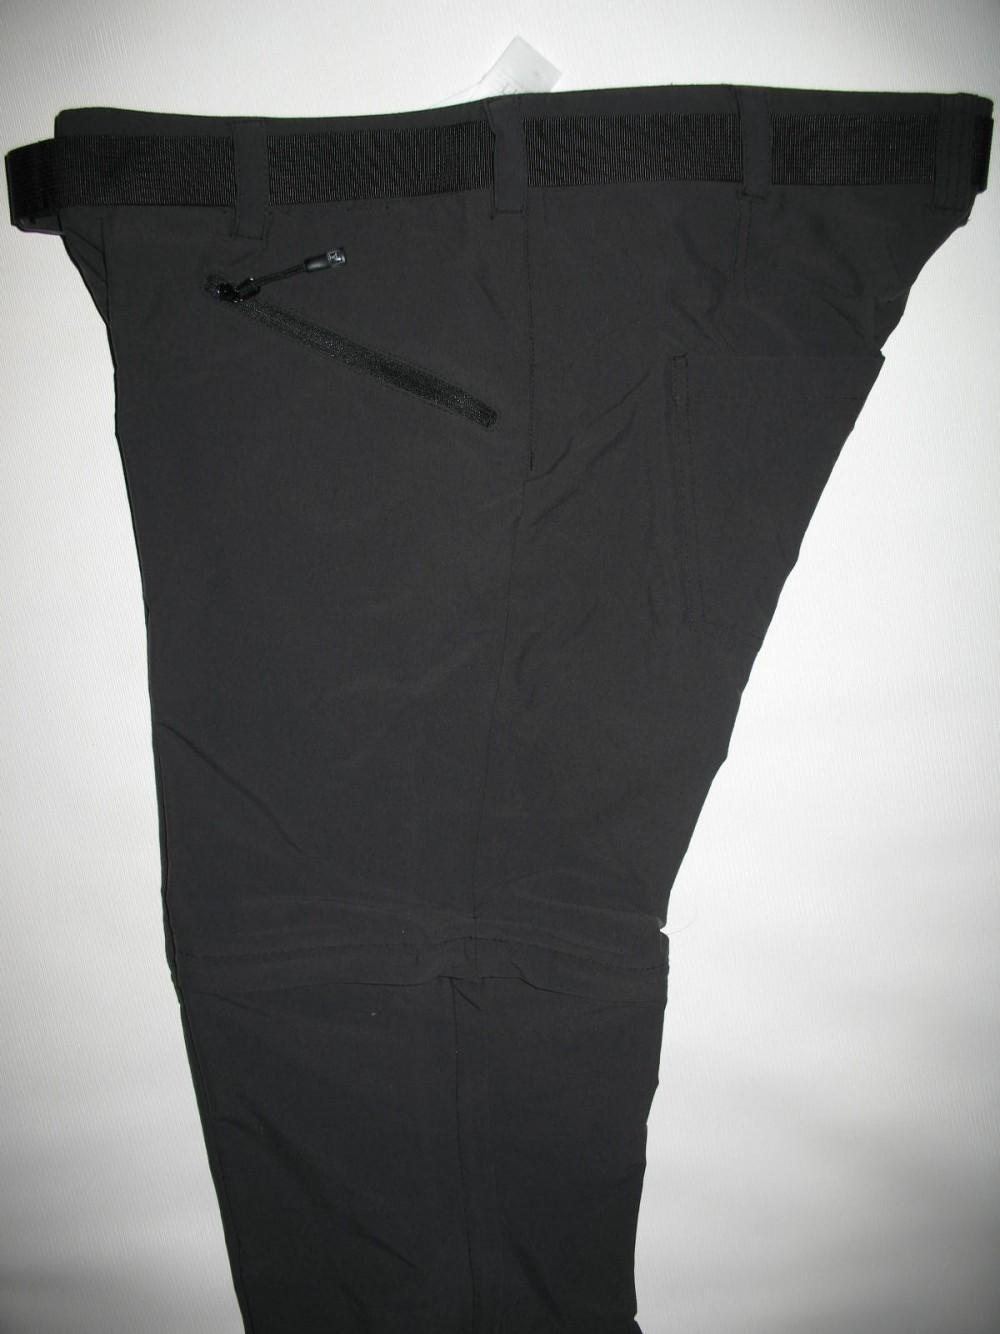 Штаны SCHOFFEL cartagena outdoor pants lady (размер 38-М) - 9